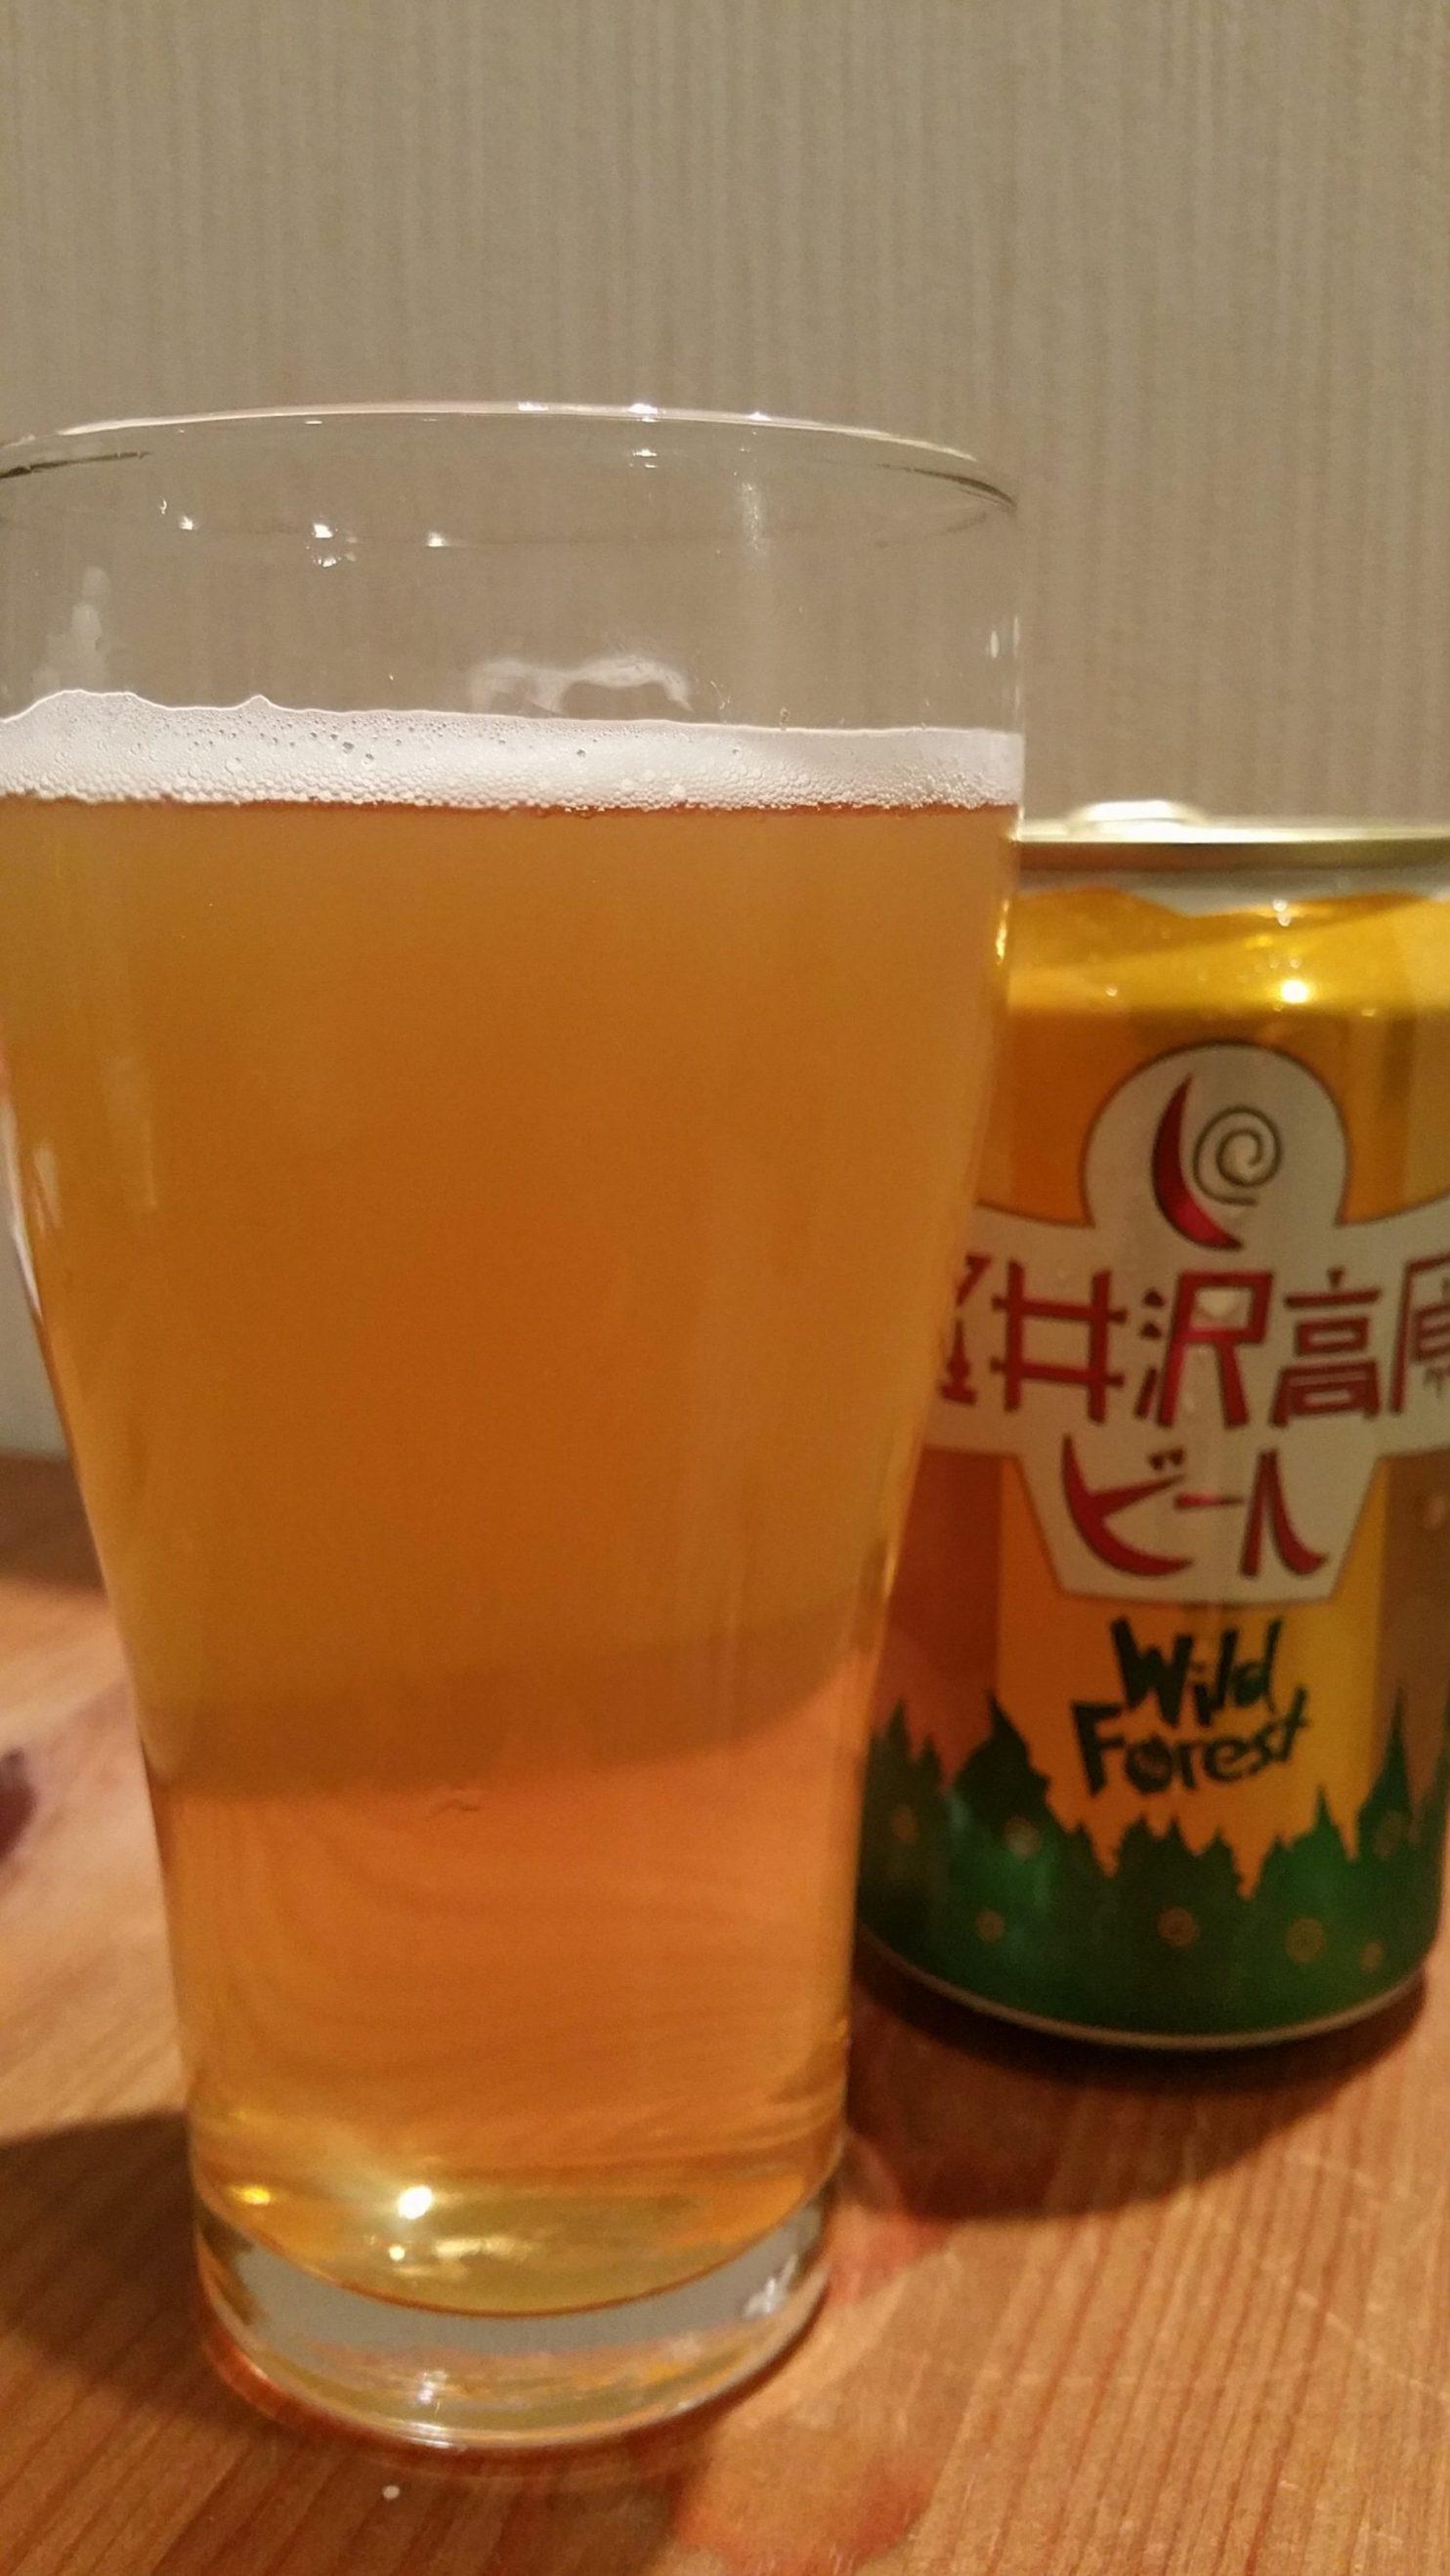 Karuizawa Wild Forest 軽井沢高原ビールワイルドフォレスト